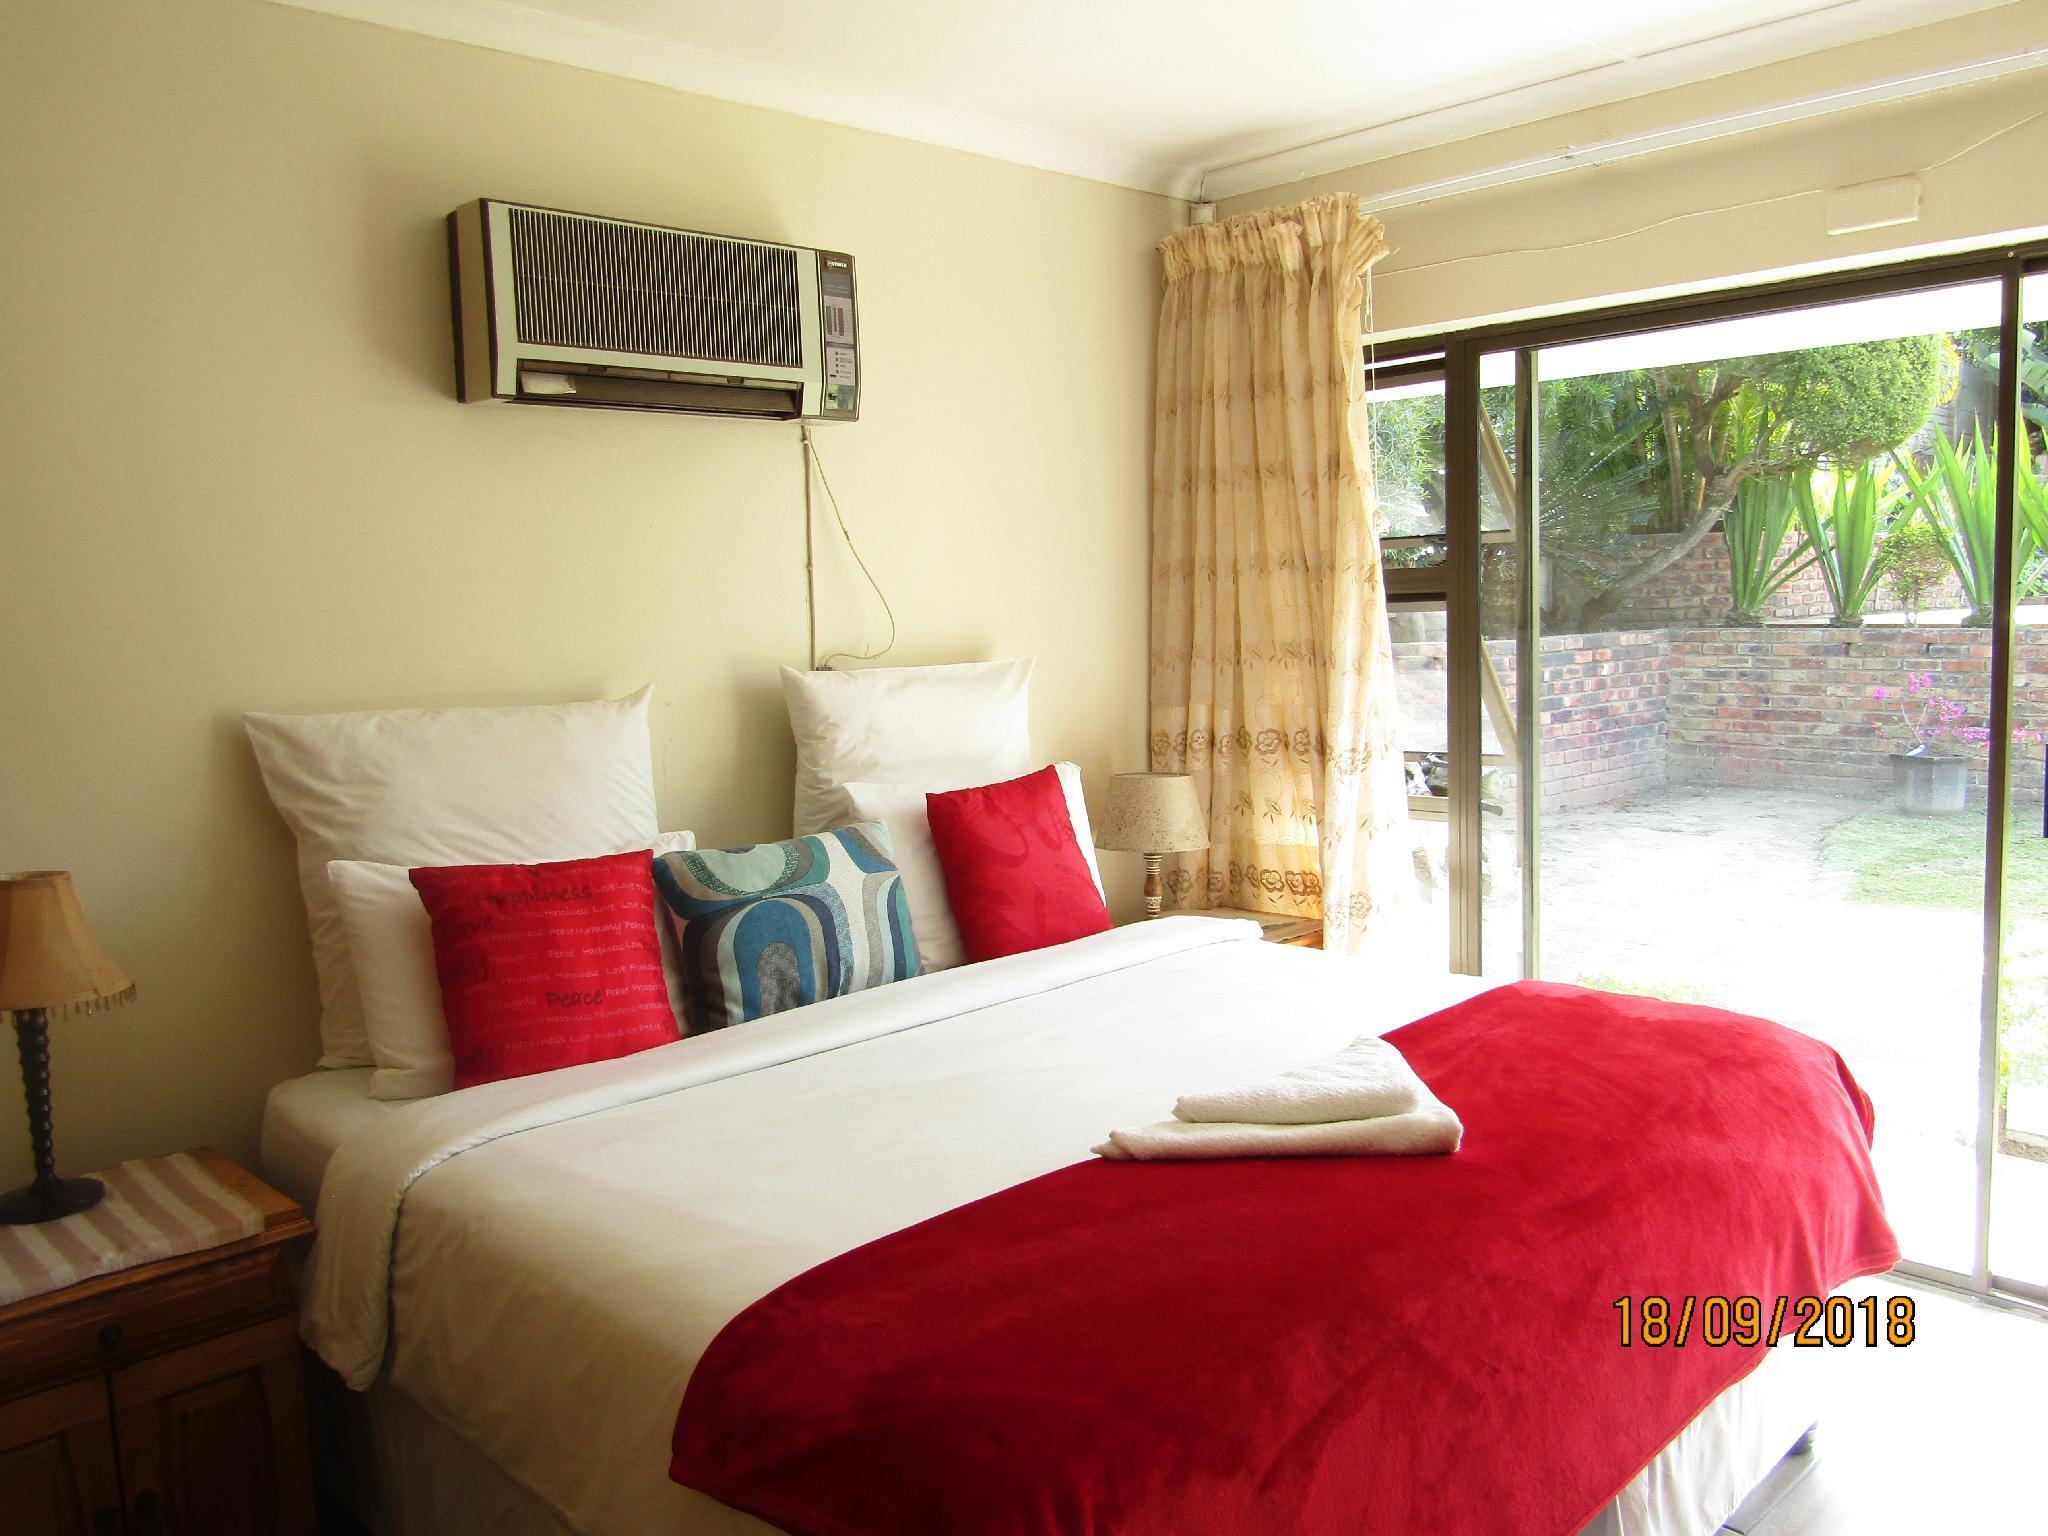 Yolonwabo Bed And Breakfast